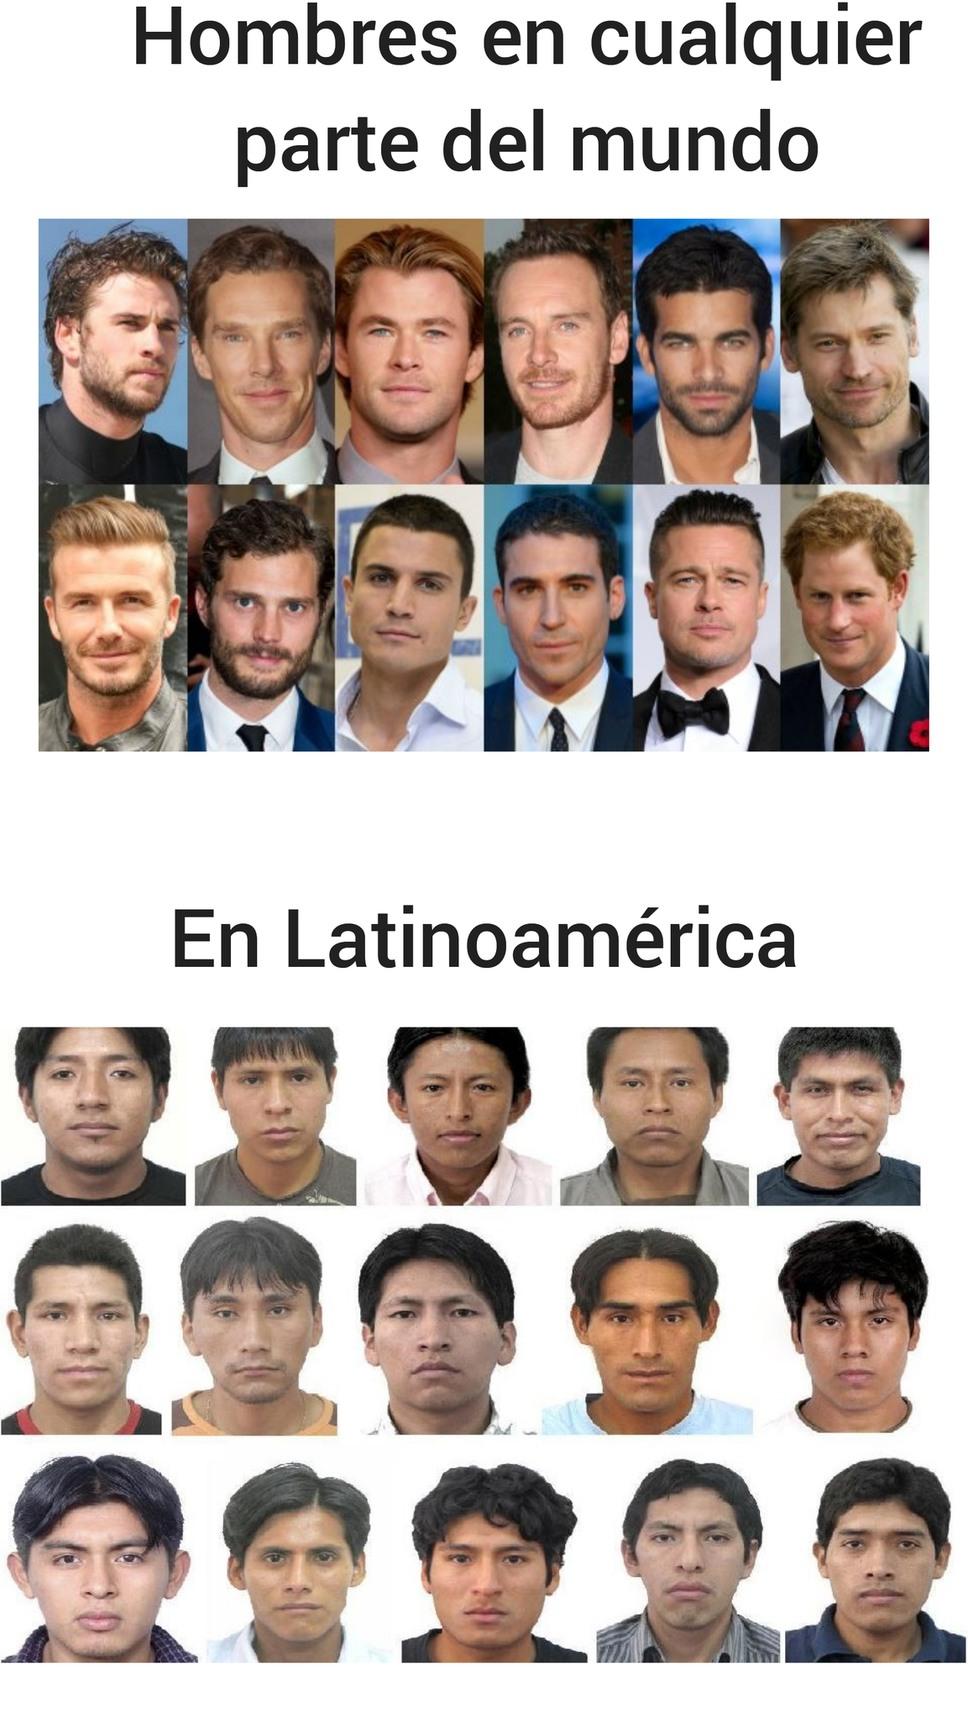 No me maten, yo también soy de Latinoamérica - meme